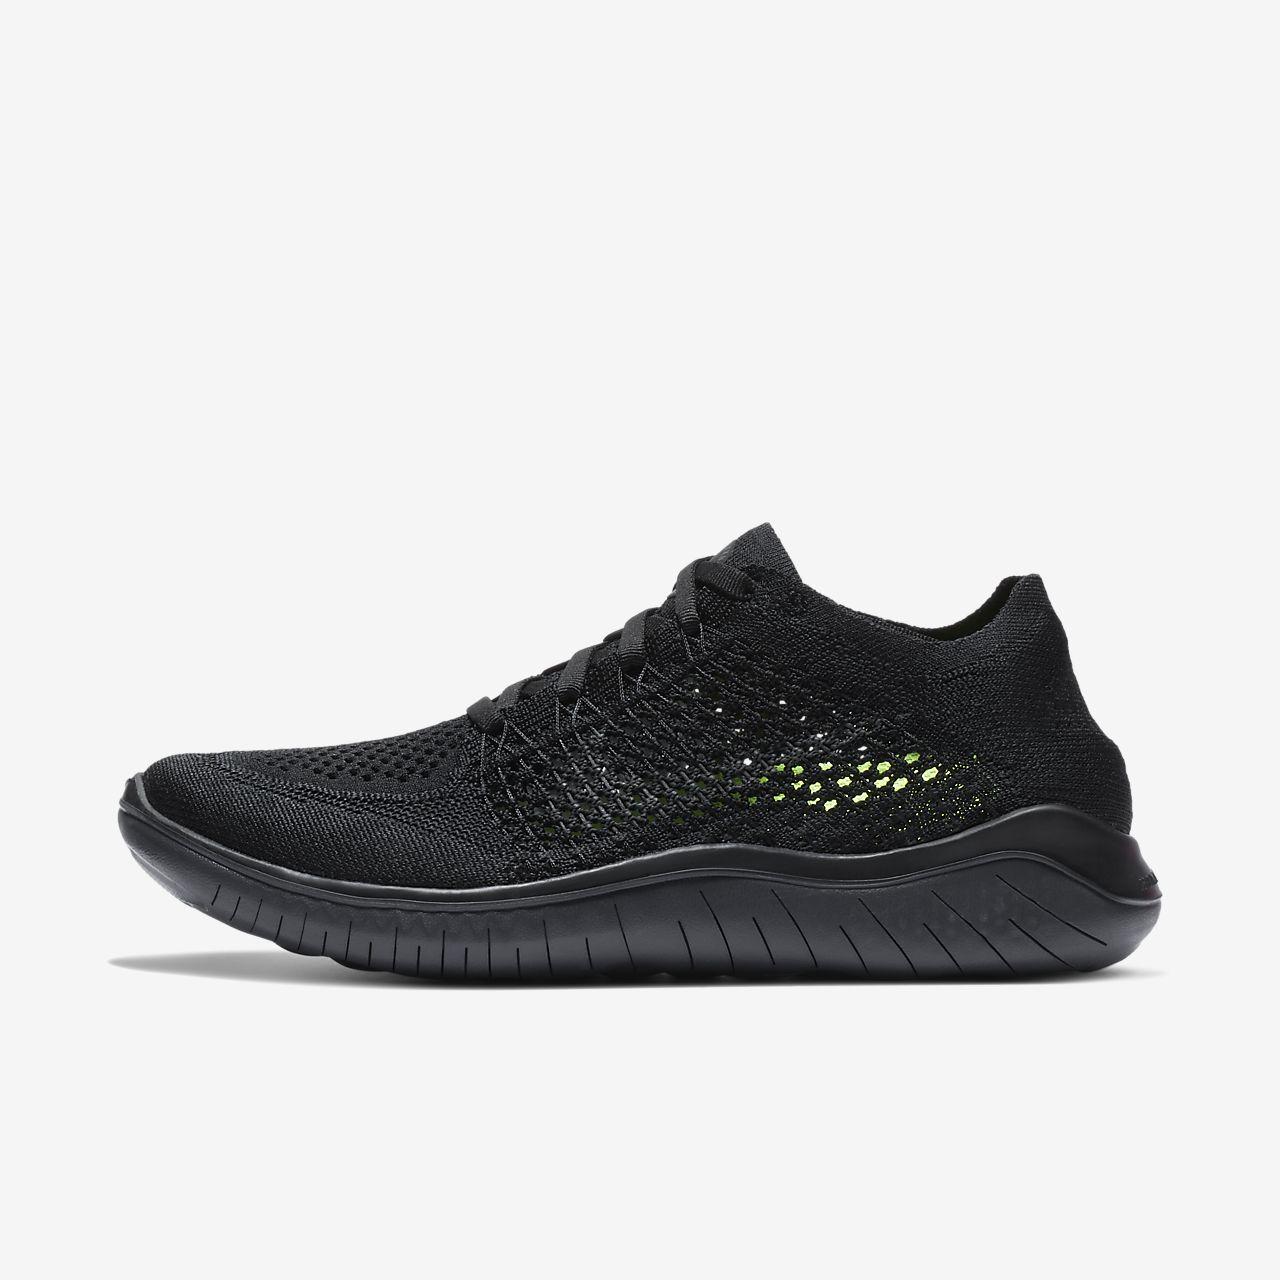 58a242fc5a084 Nike Free RN Flyknit 2018 Women s Running Shoe. Nike.com